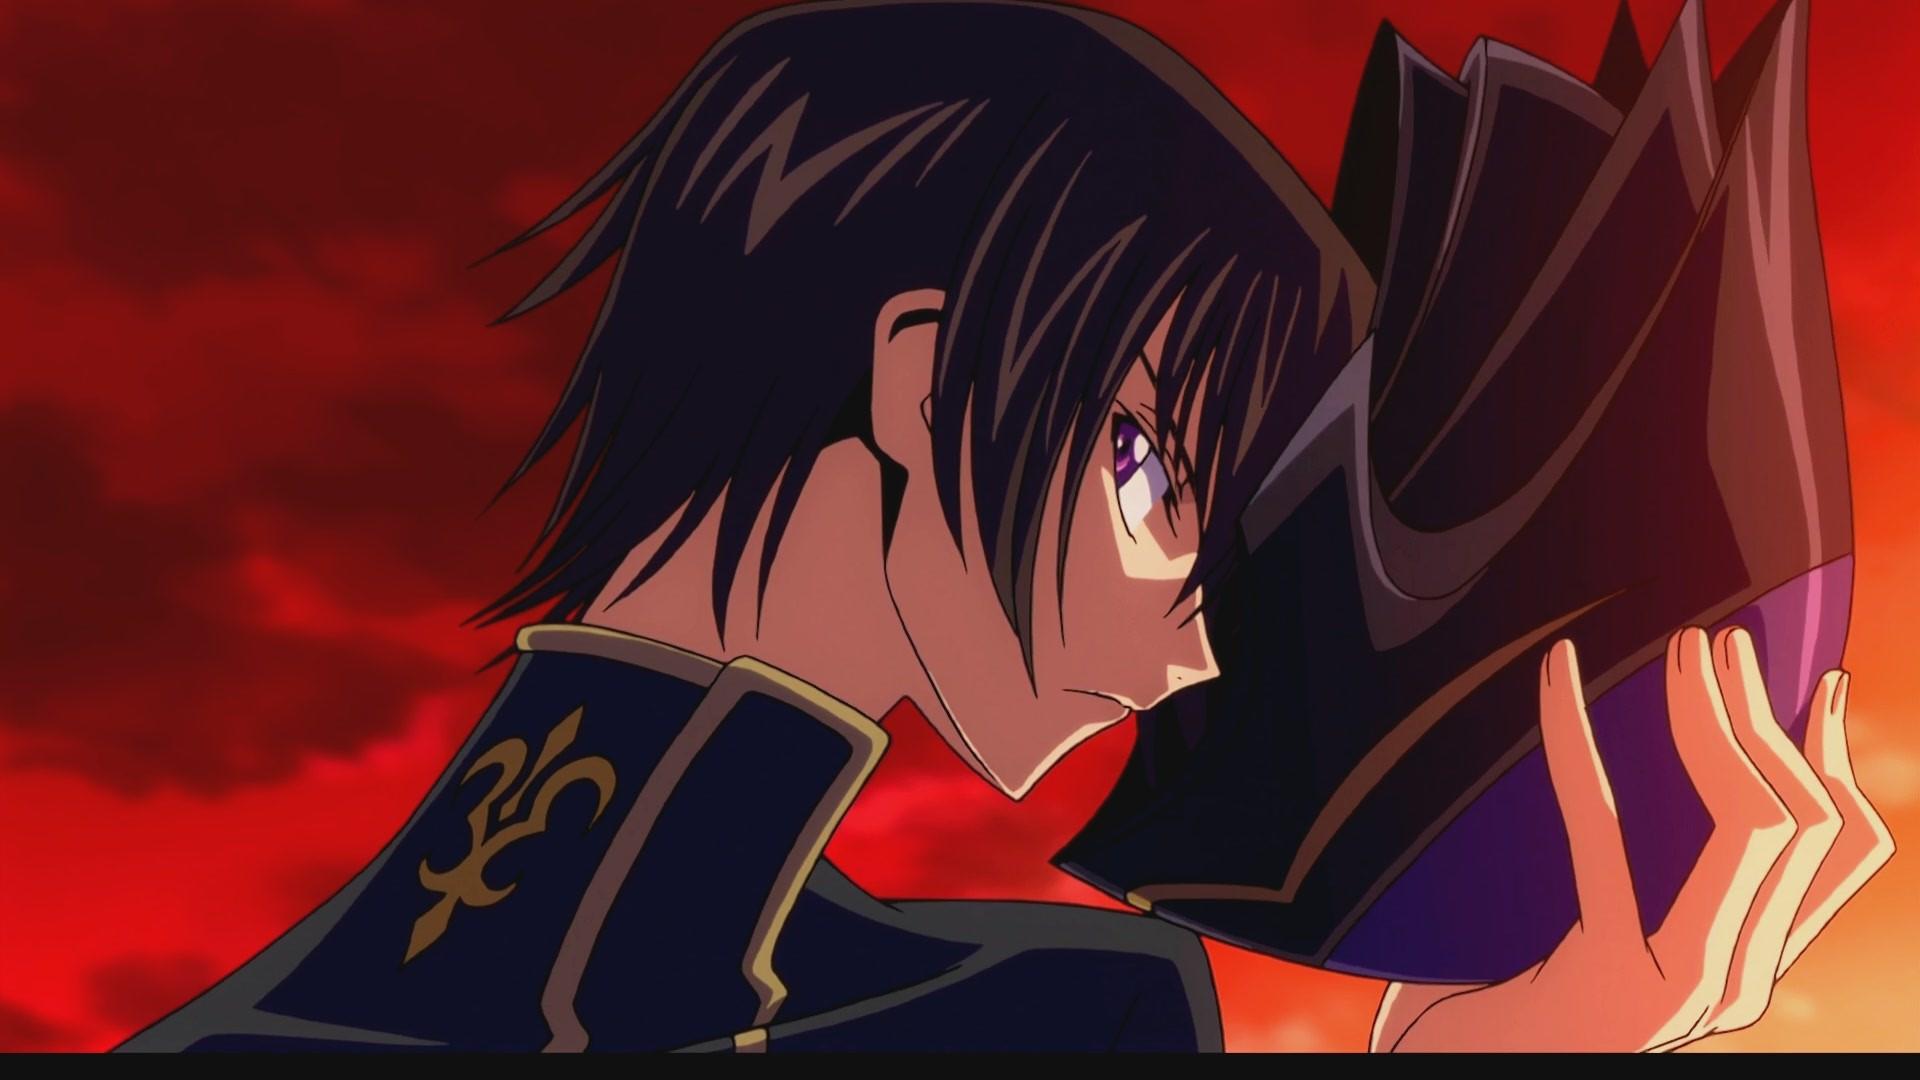 code geass lamperouge lelouch HD Wallpaper   Anime Manga 1123131 1920x1080